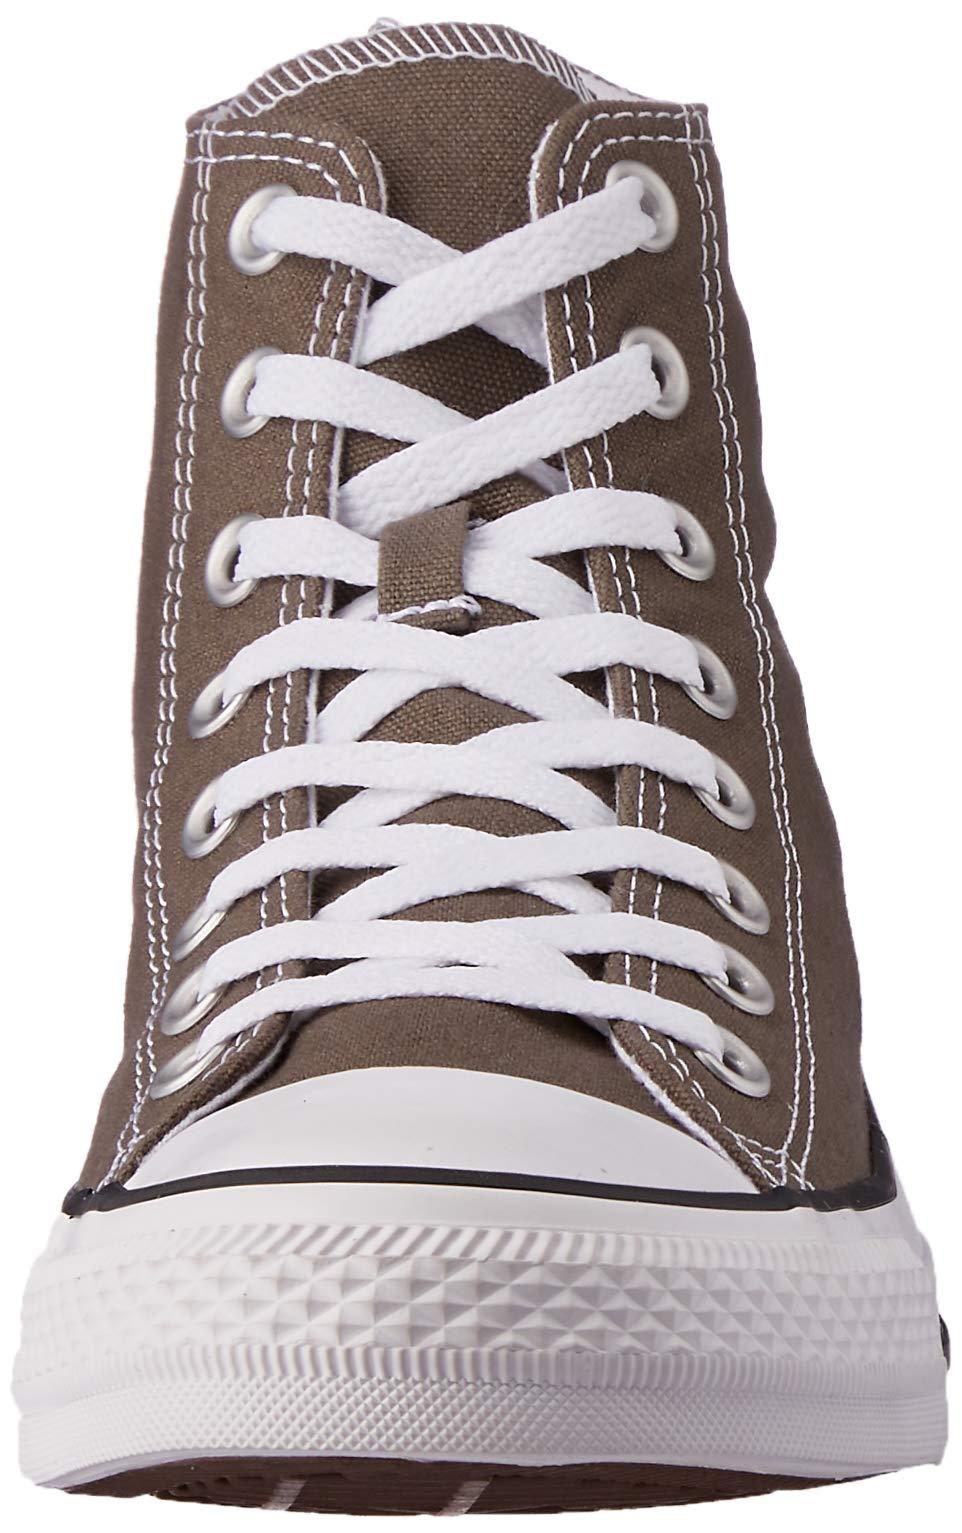 converse all star scarpe da ginnastica unisex adulto